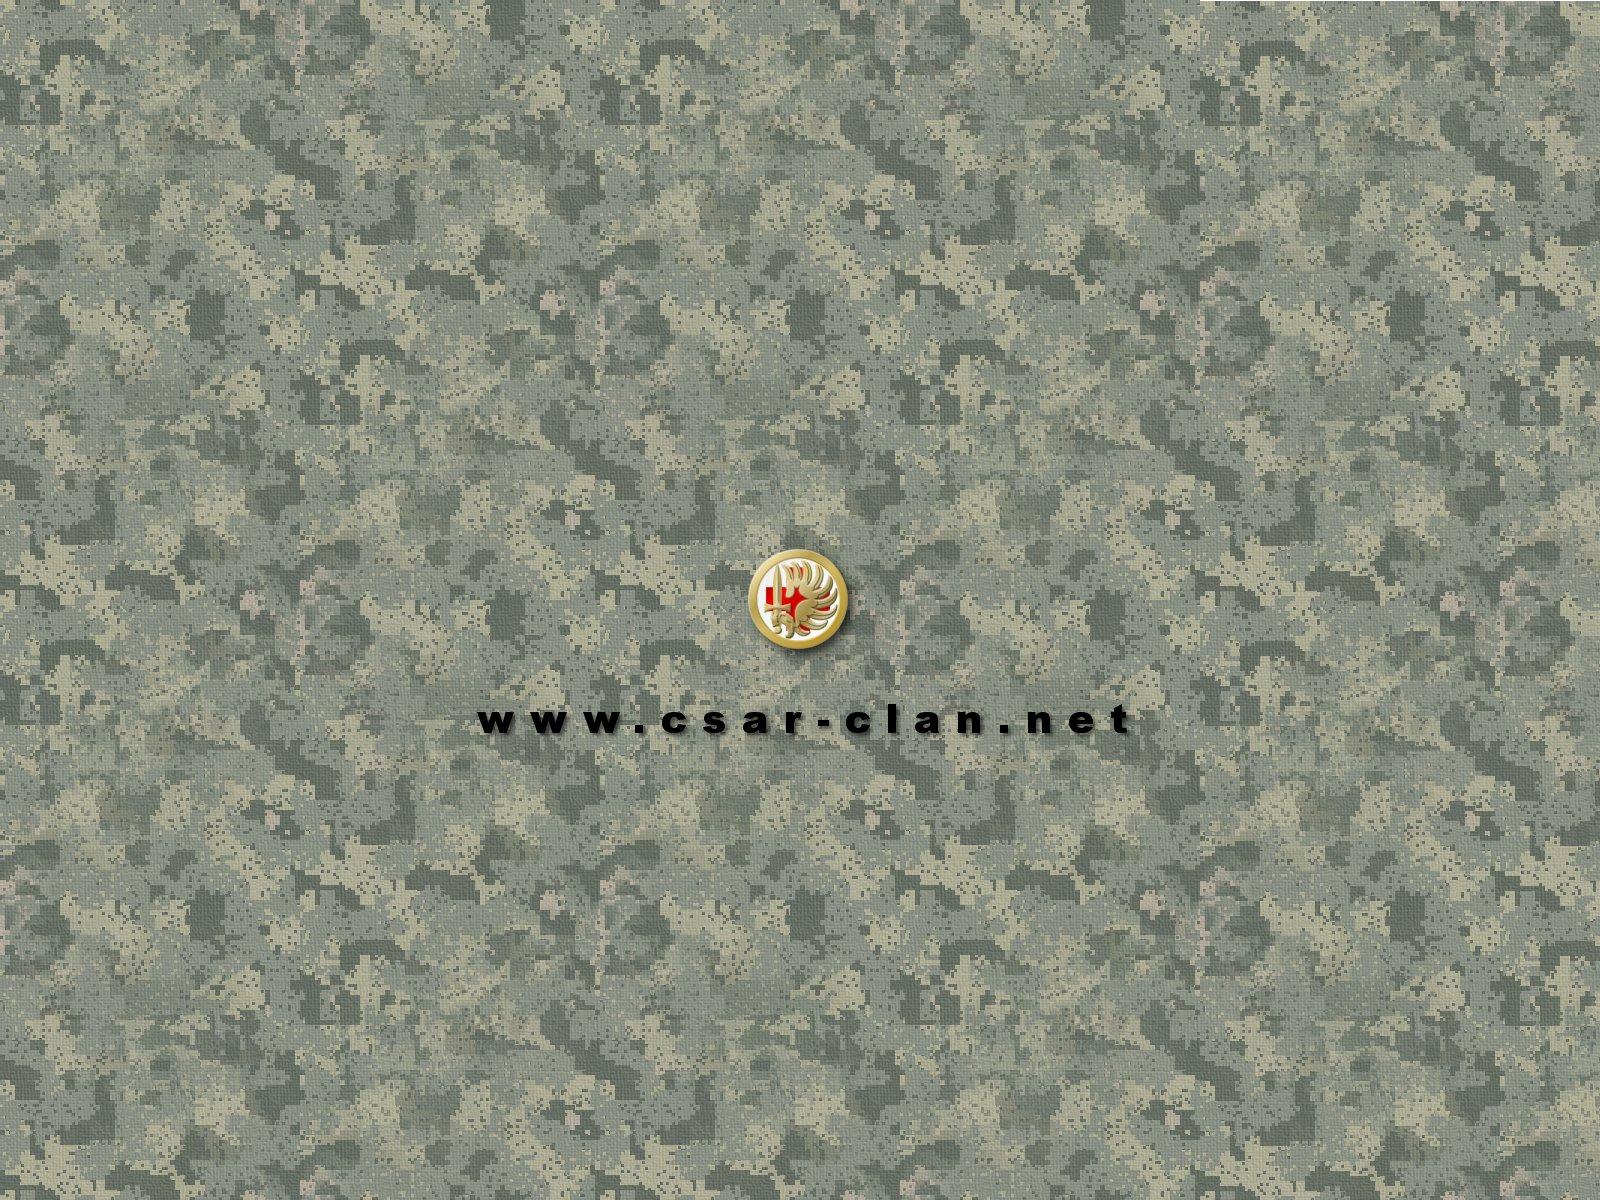 Hd Camo Wallpaper Download Wallpaper DaWallpaperz 1600x1200